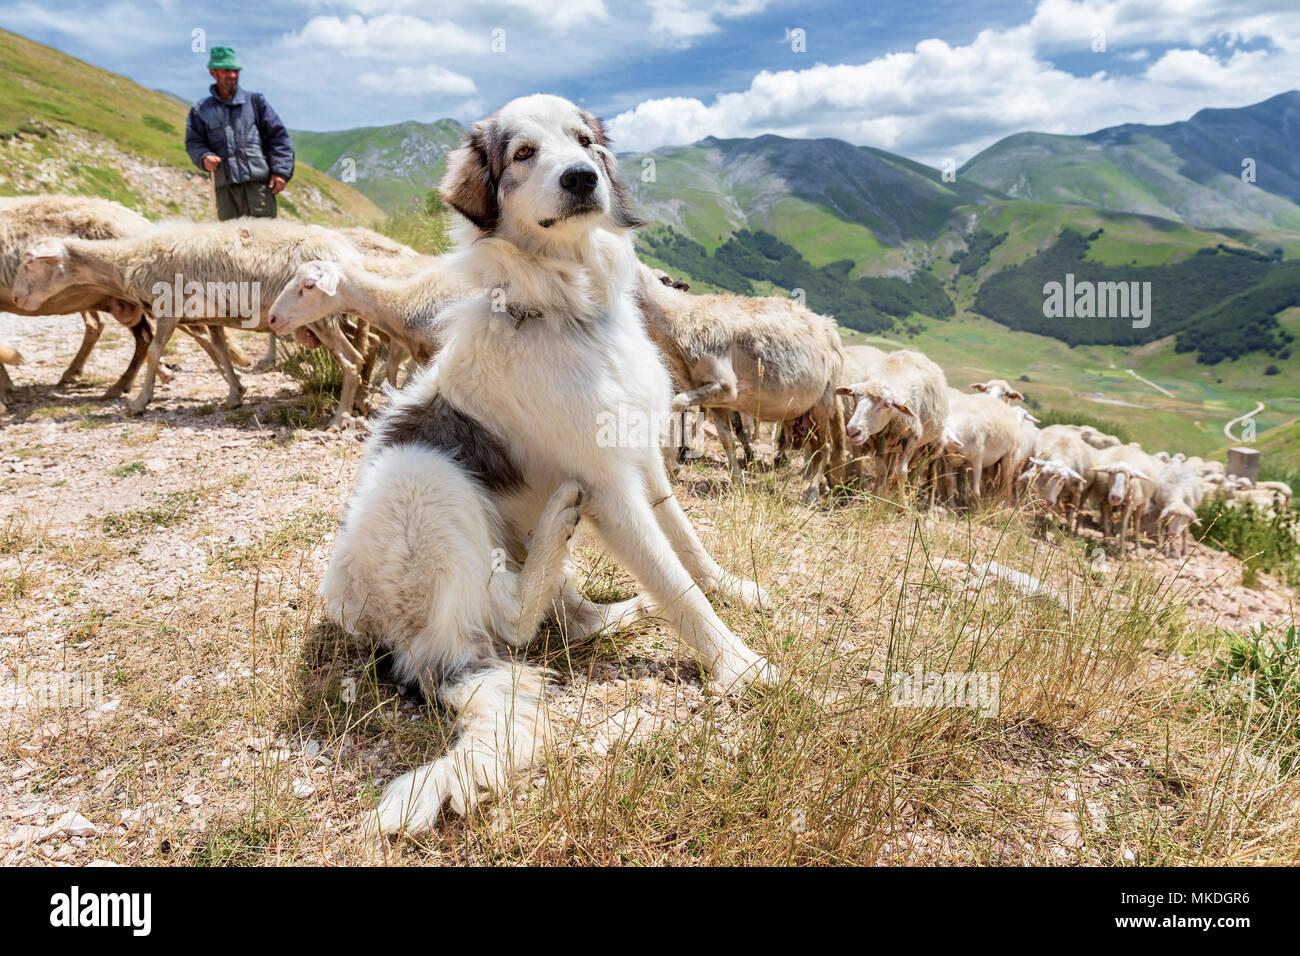 A Maremma sheepdog guarding sheep, Piano Grande, Monti Sibillini National Park, Umbria, Italy - Stock Image